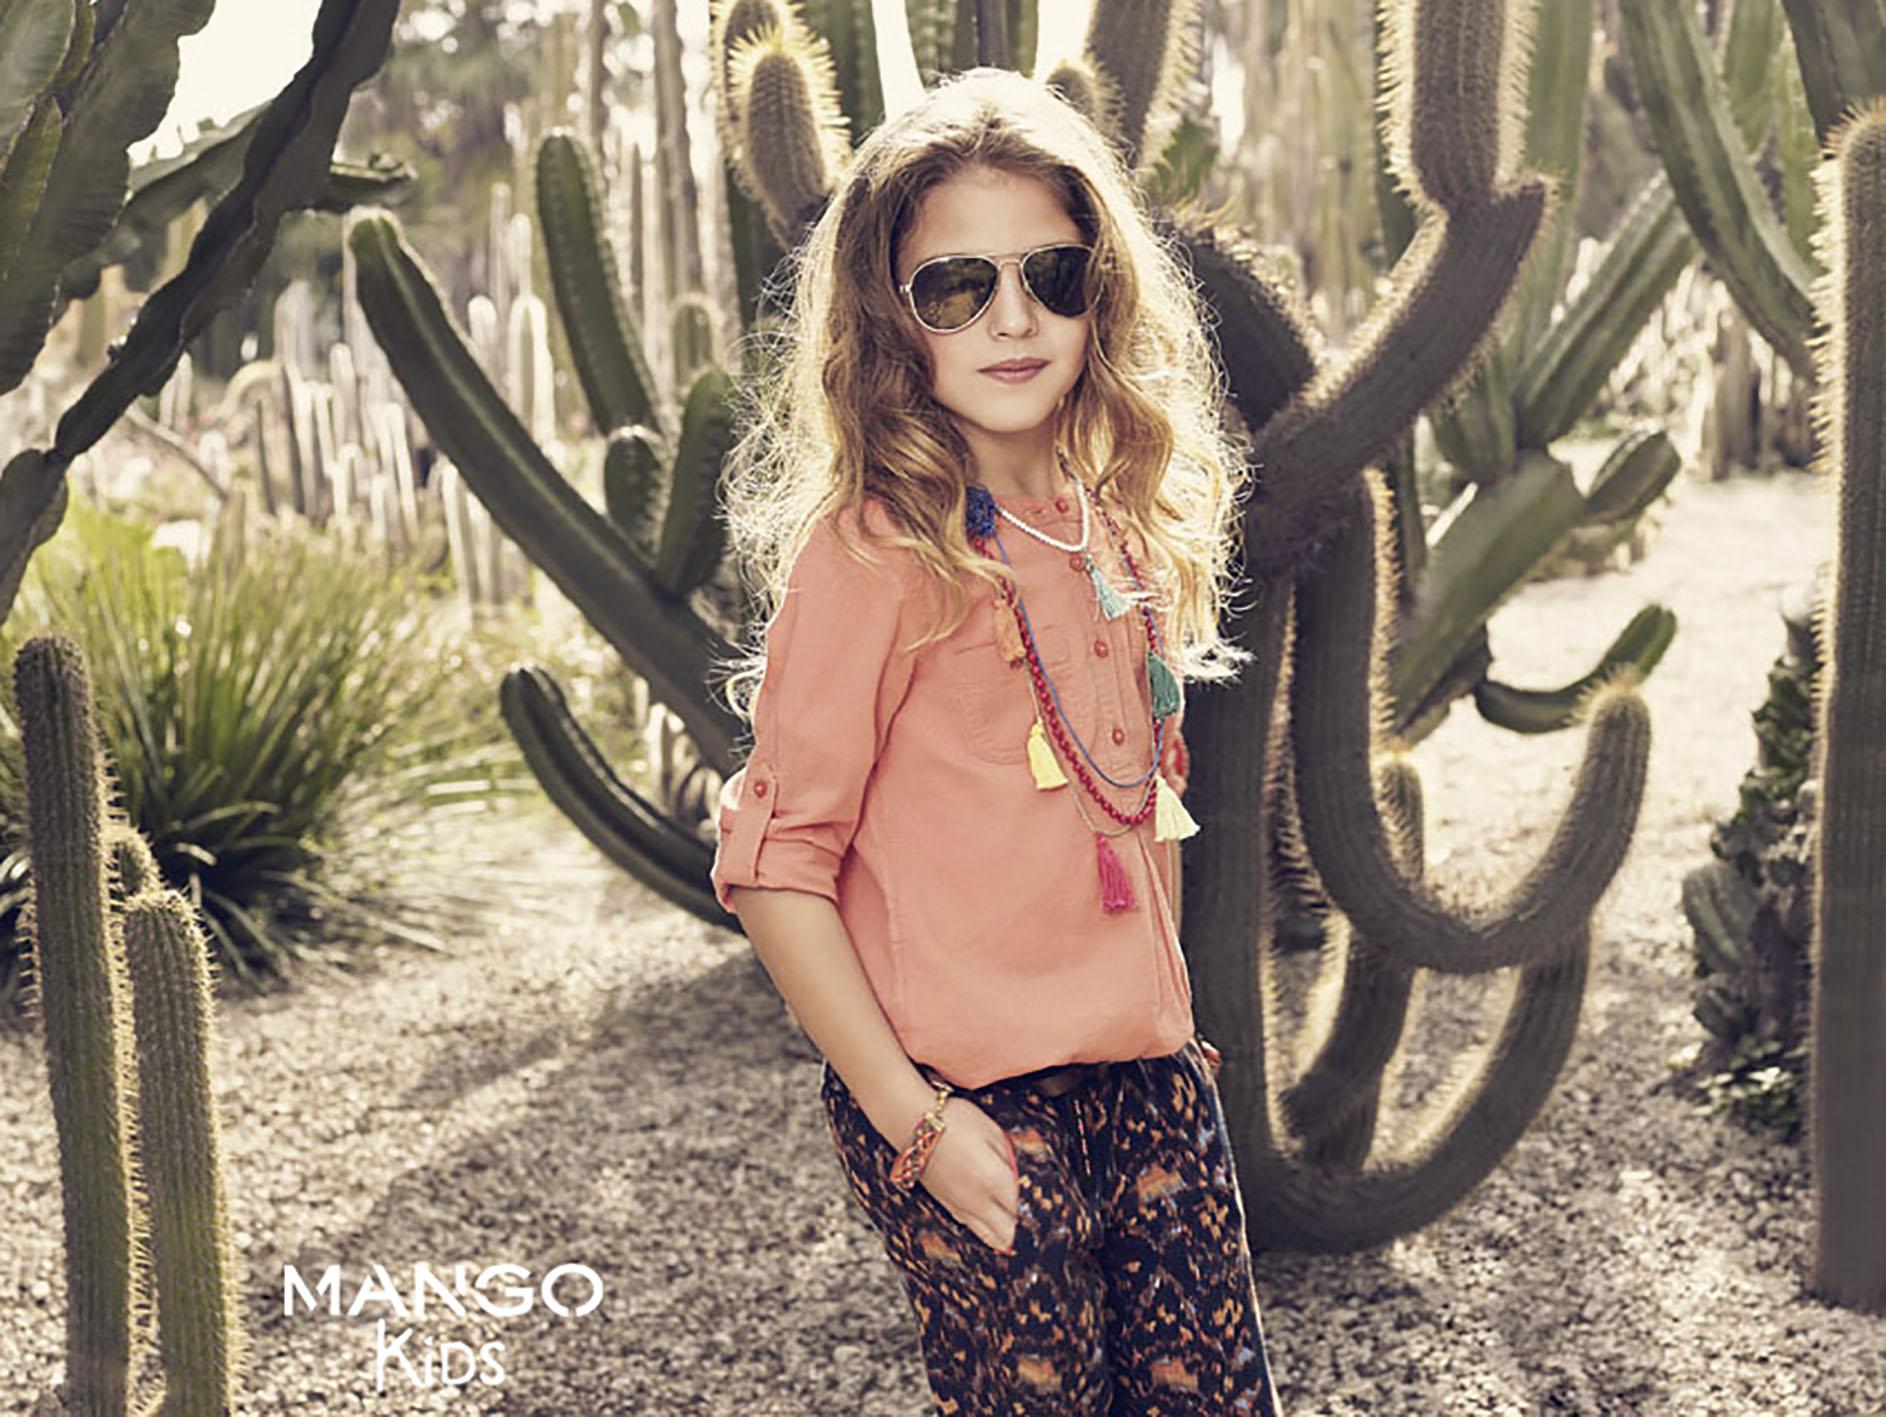 Mango 02.jpg